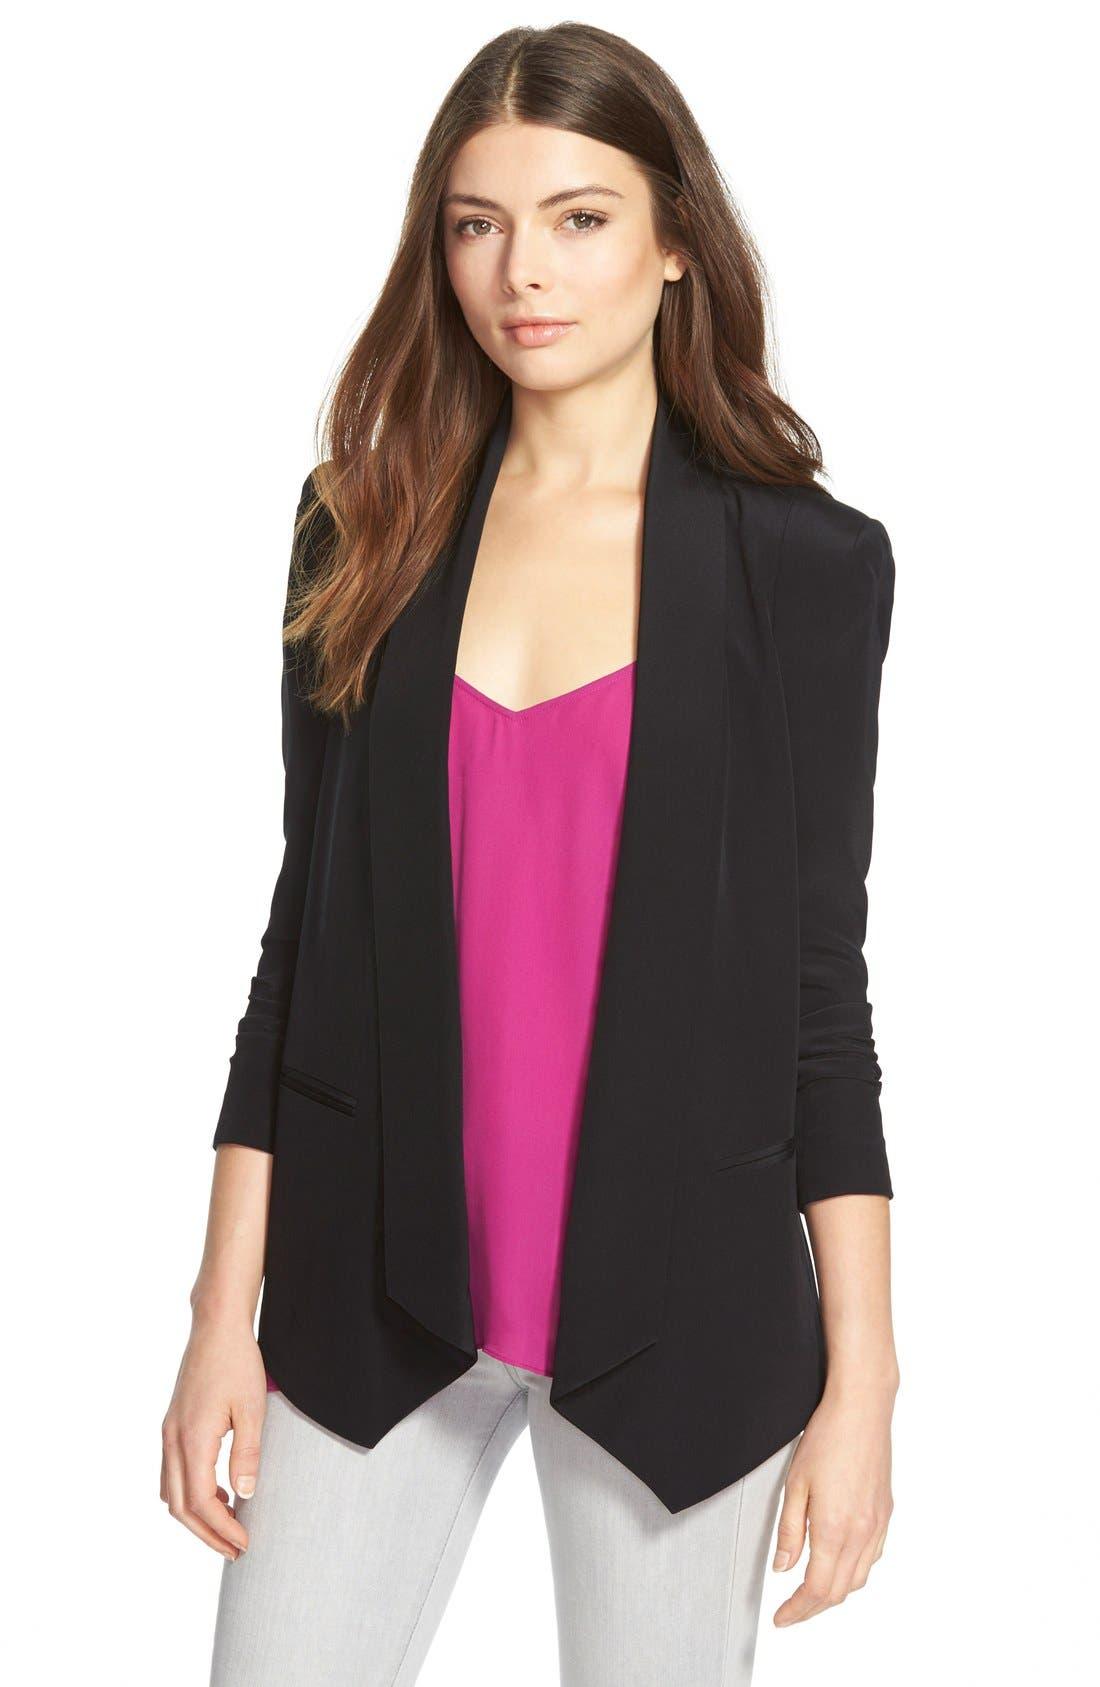 REBECCA MINKOFF 'Becky' Long Tuxedo Blazer, Main, color, 001